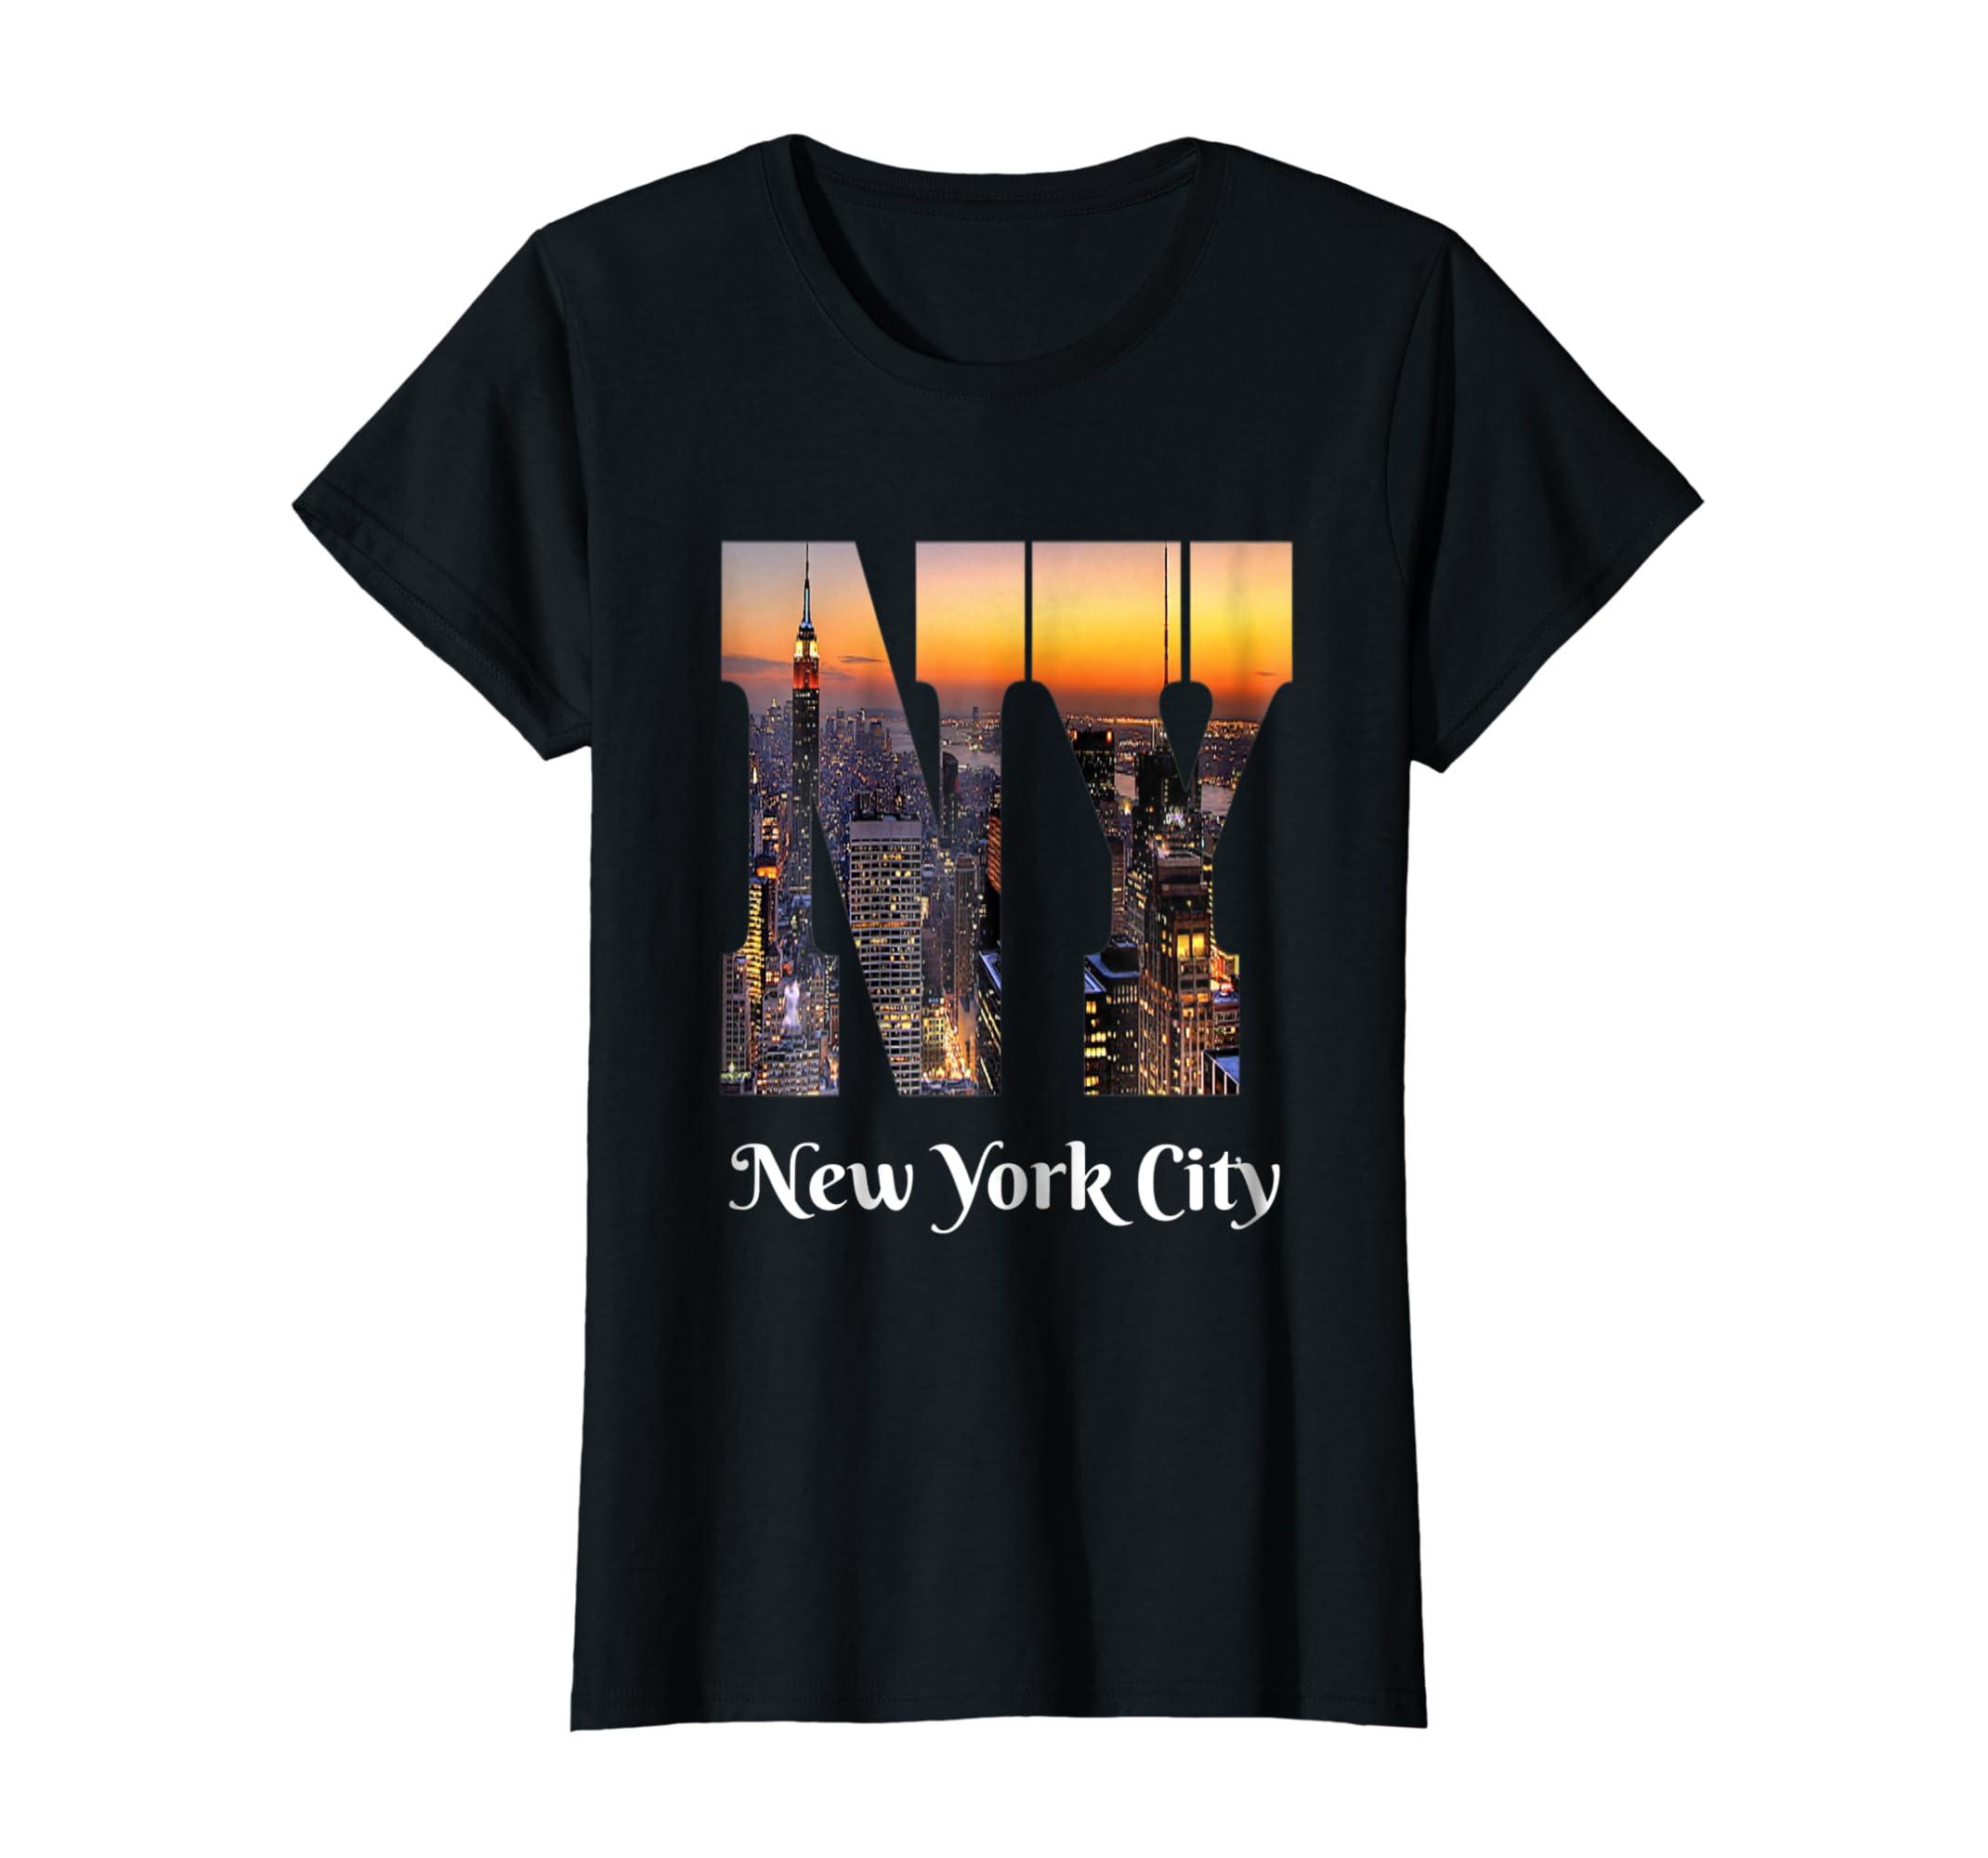 New York City Iconic Skyline T shirt-Bawle